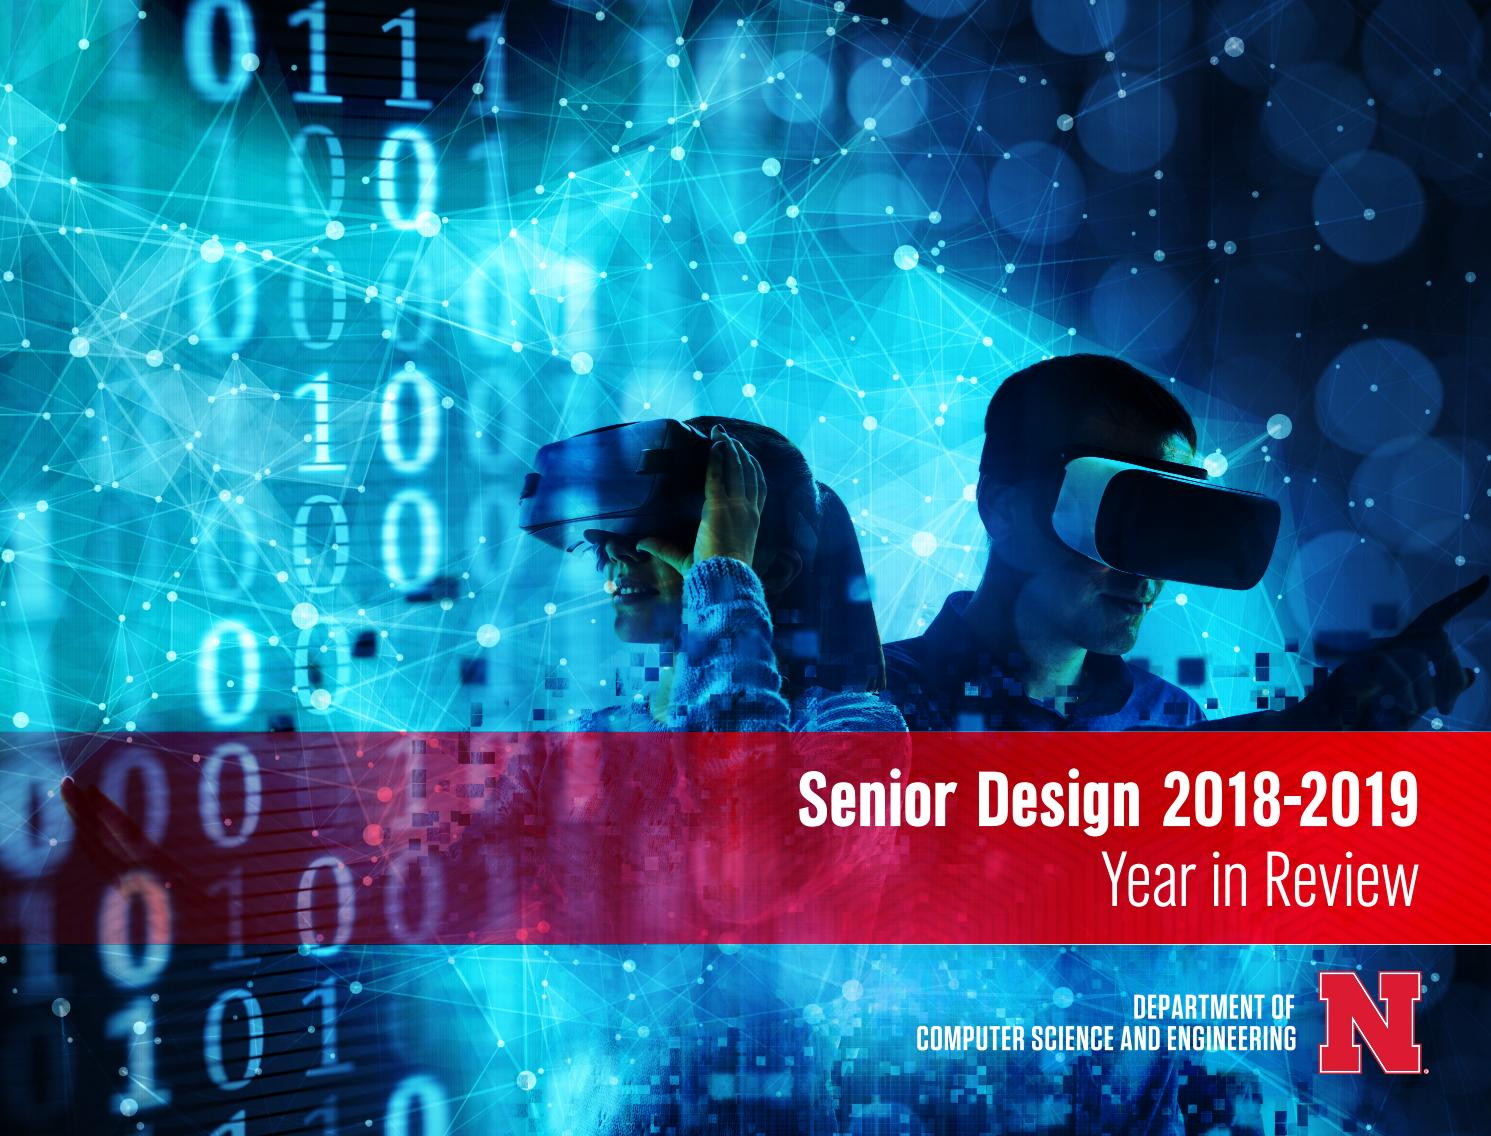 UNL Computer Science & Engineering Senior Design 2018-2019